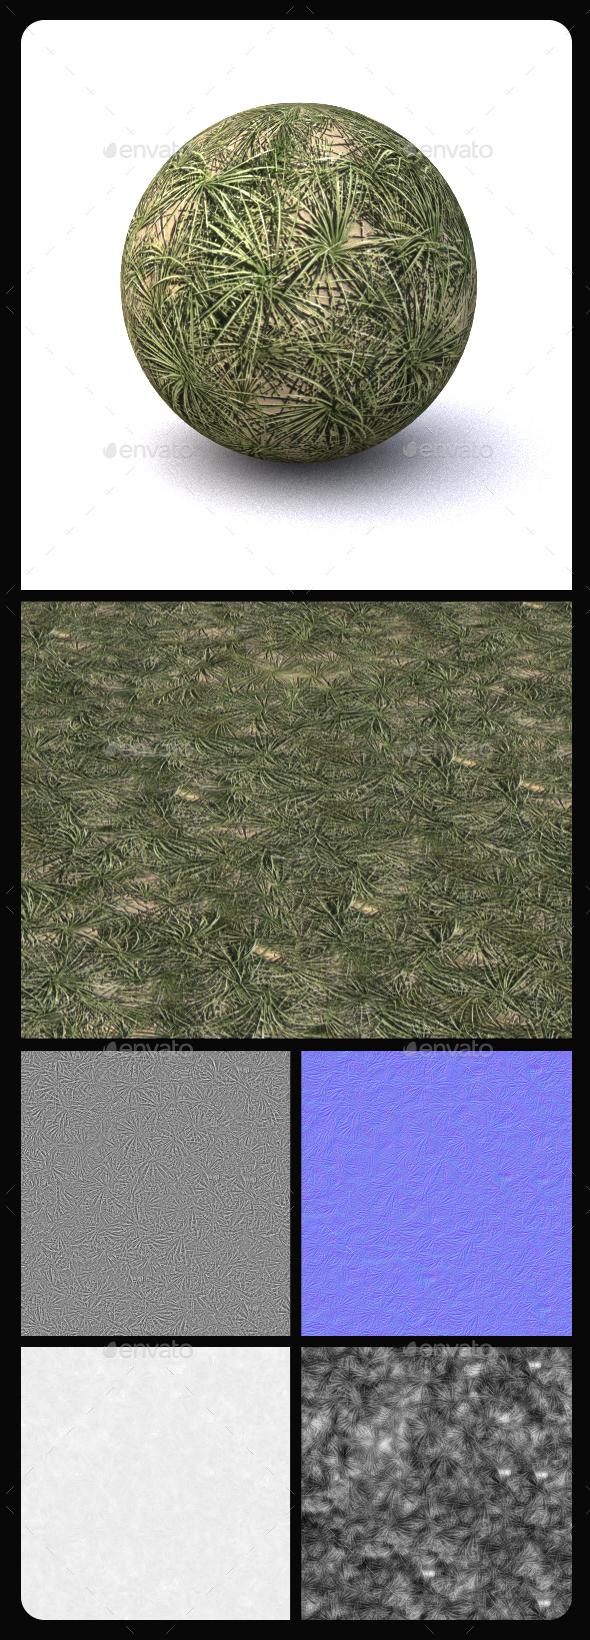 Grass Tile Texture 9 - 3DOcean Item for Sale